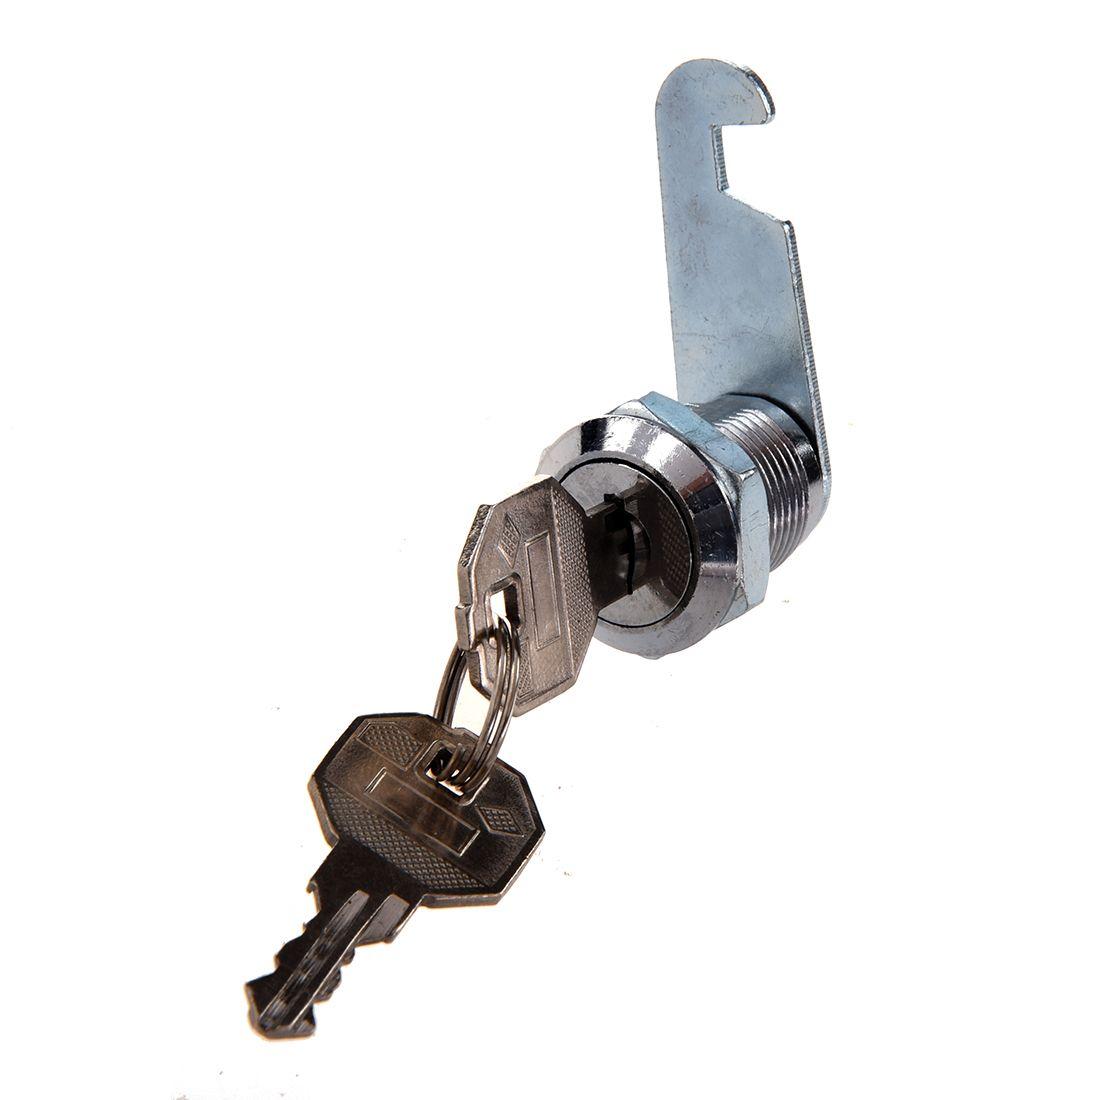 Hot Sale18 5mm Thread Metal Tubular Cam Lock For Cabinet Drawer Tool Box Tool Box Cabinet Drawers Sodial